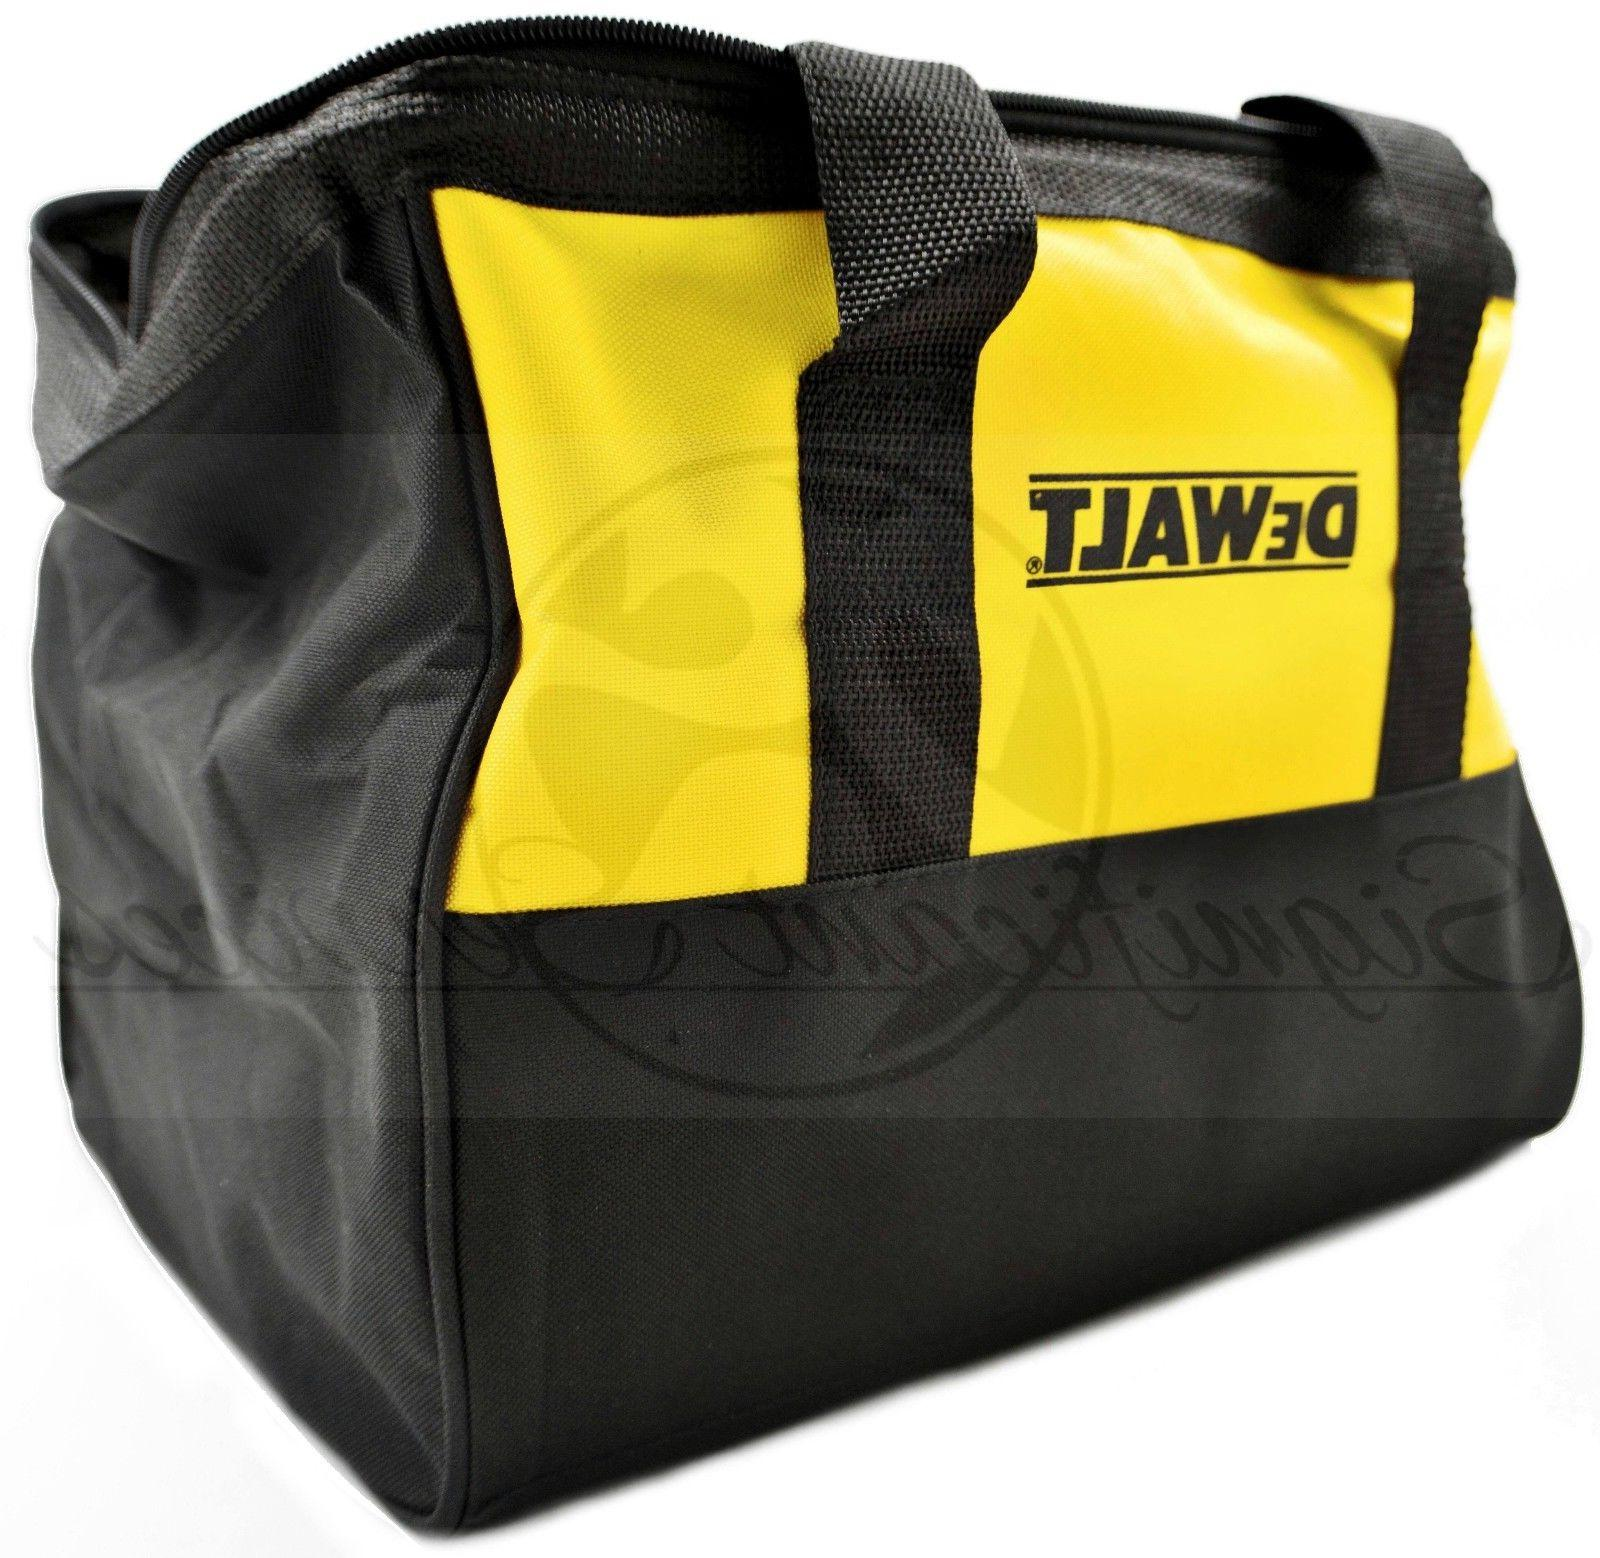 "NEW DeWALT 13"" Duty Nylon Canvas Contractor Tool Bag Pocket 6 N037466"